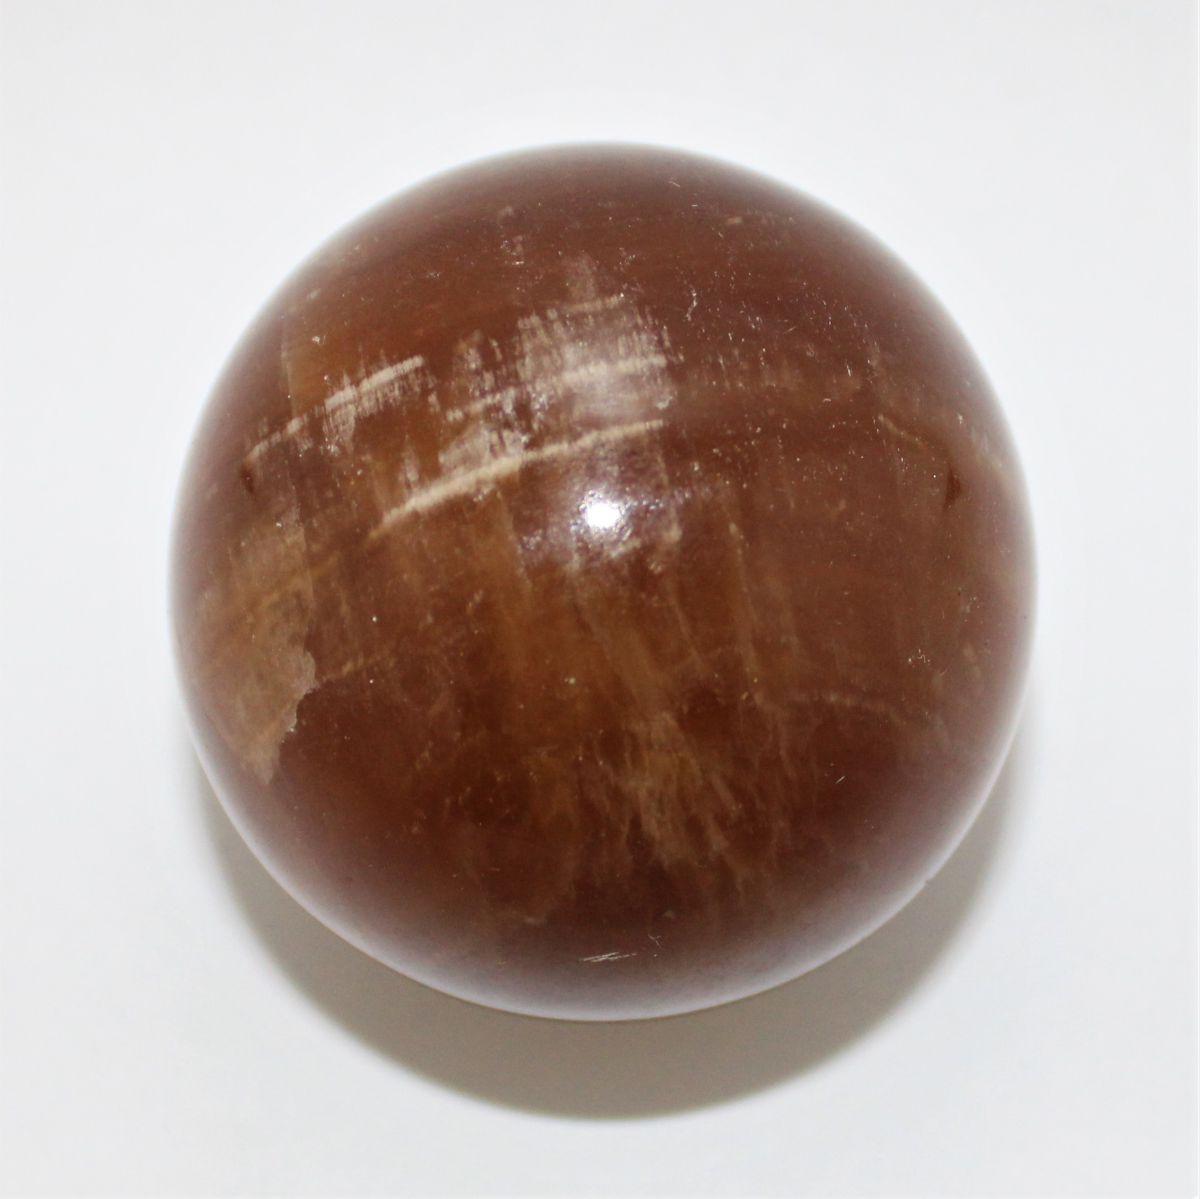 yb0122